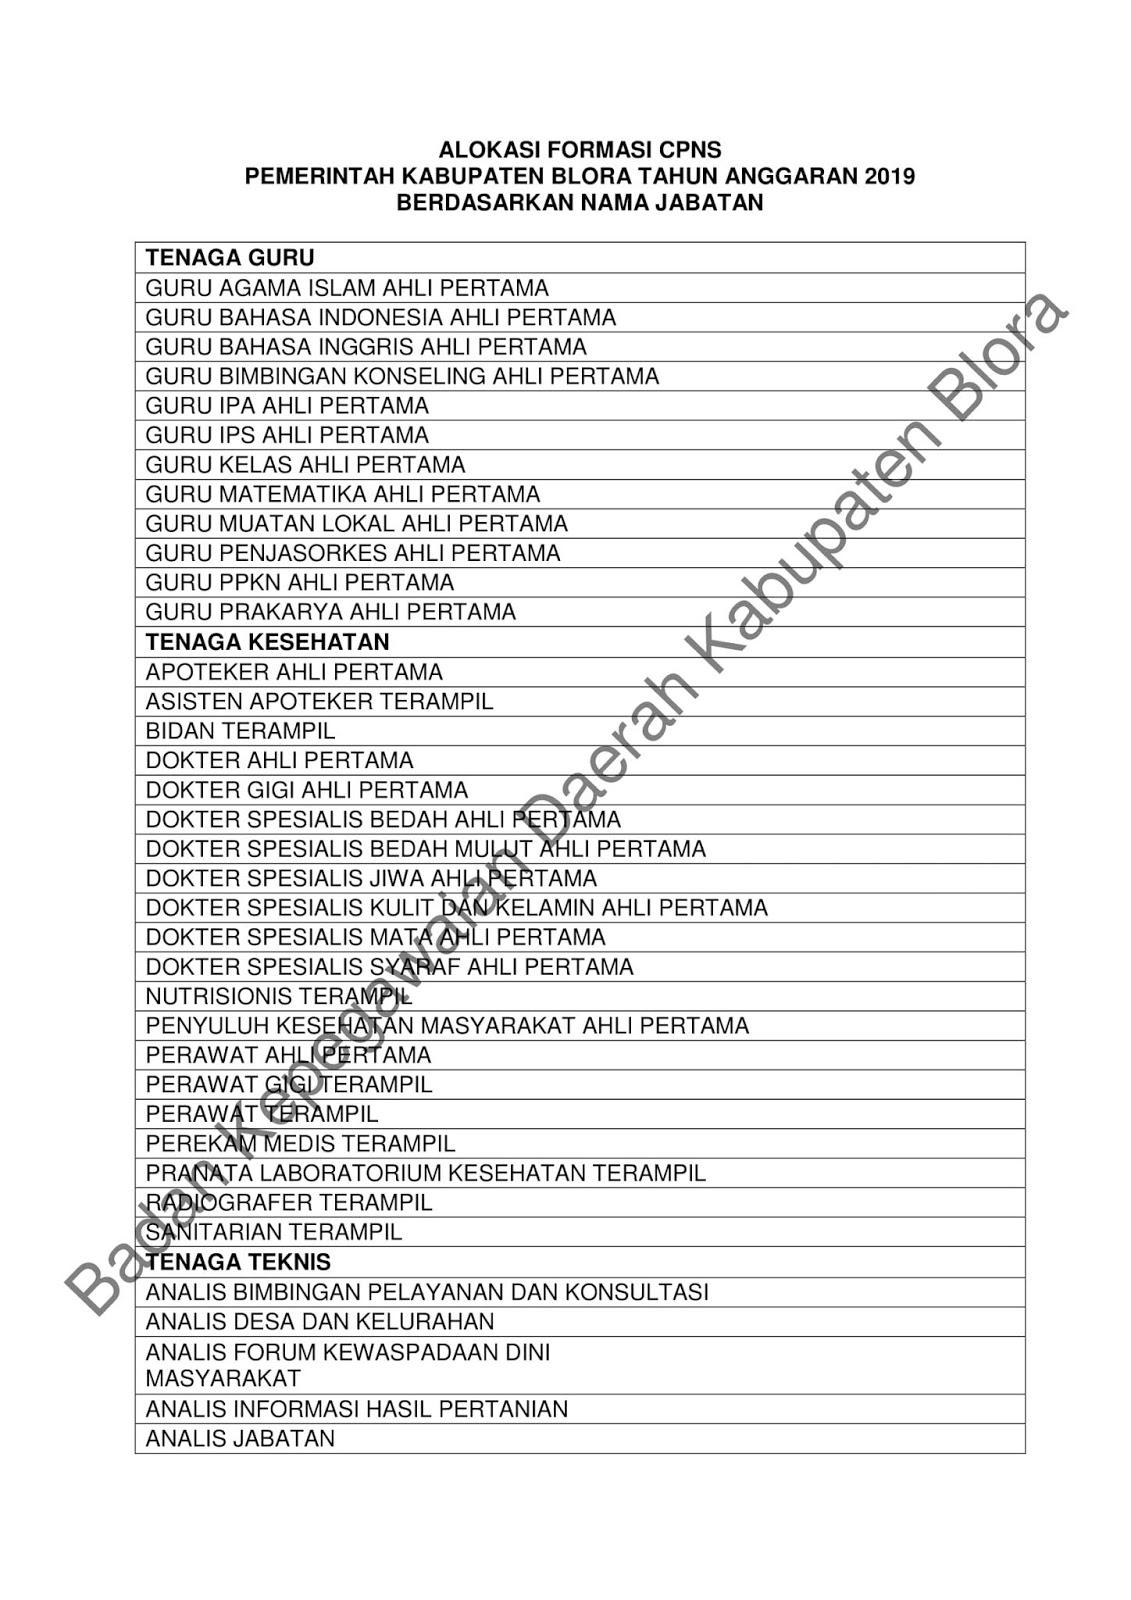 Lowongan CPNS Kabupaten Blora Tahun 2019 [561 Formasi]